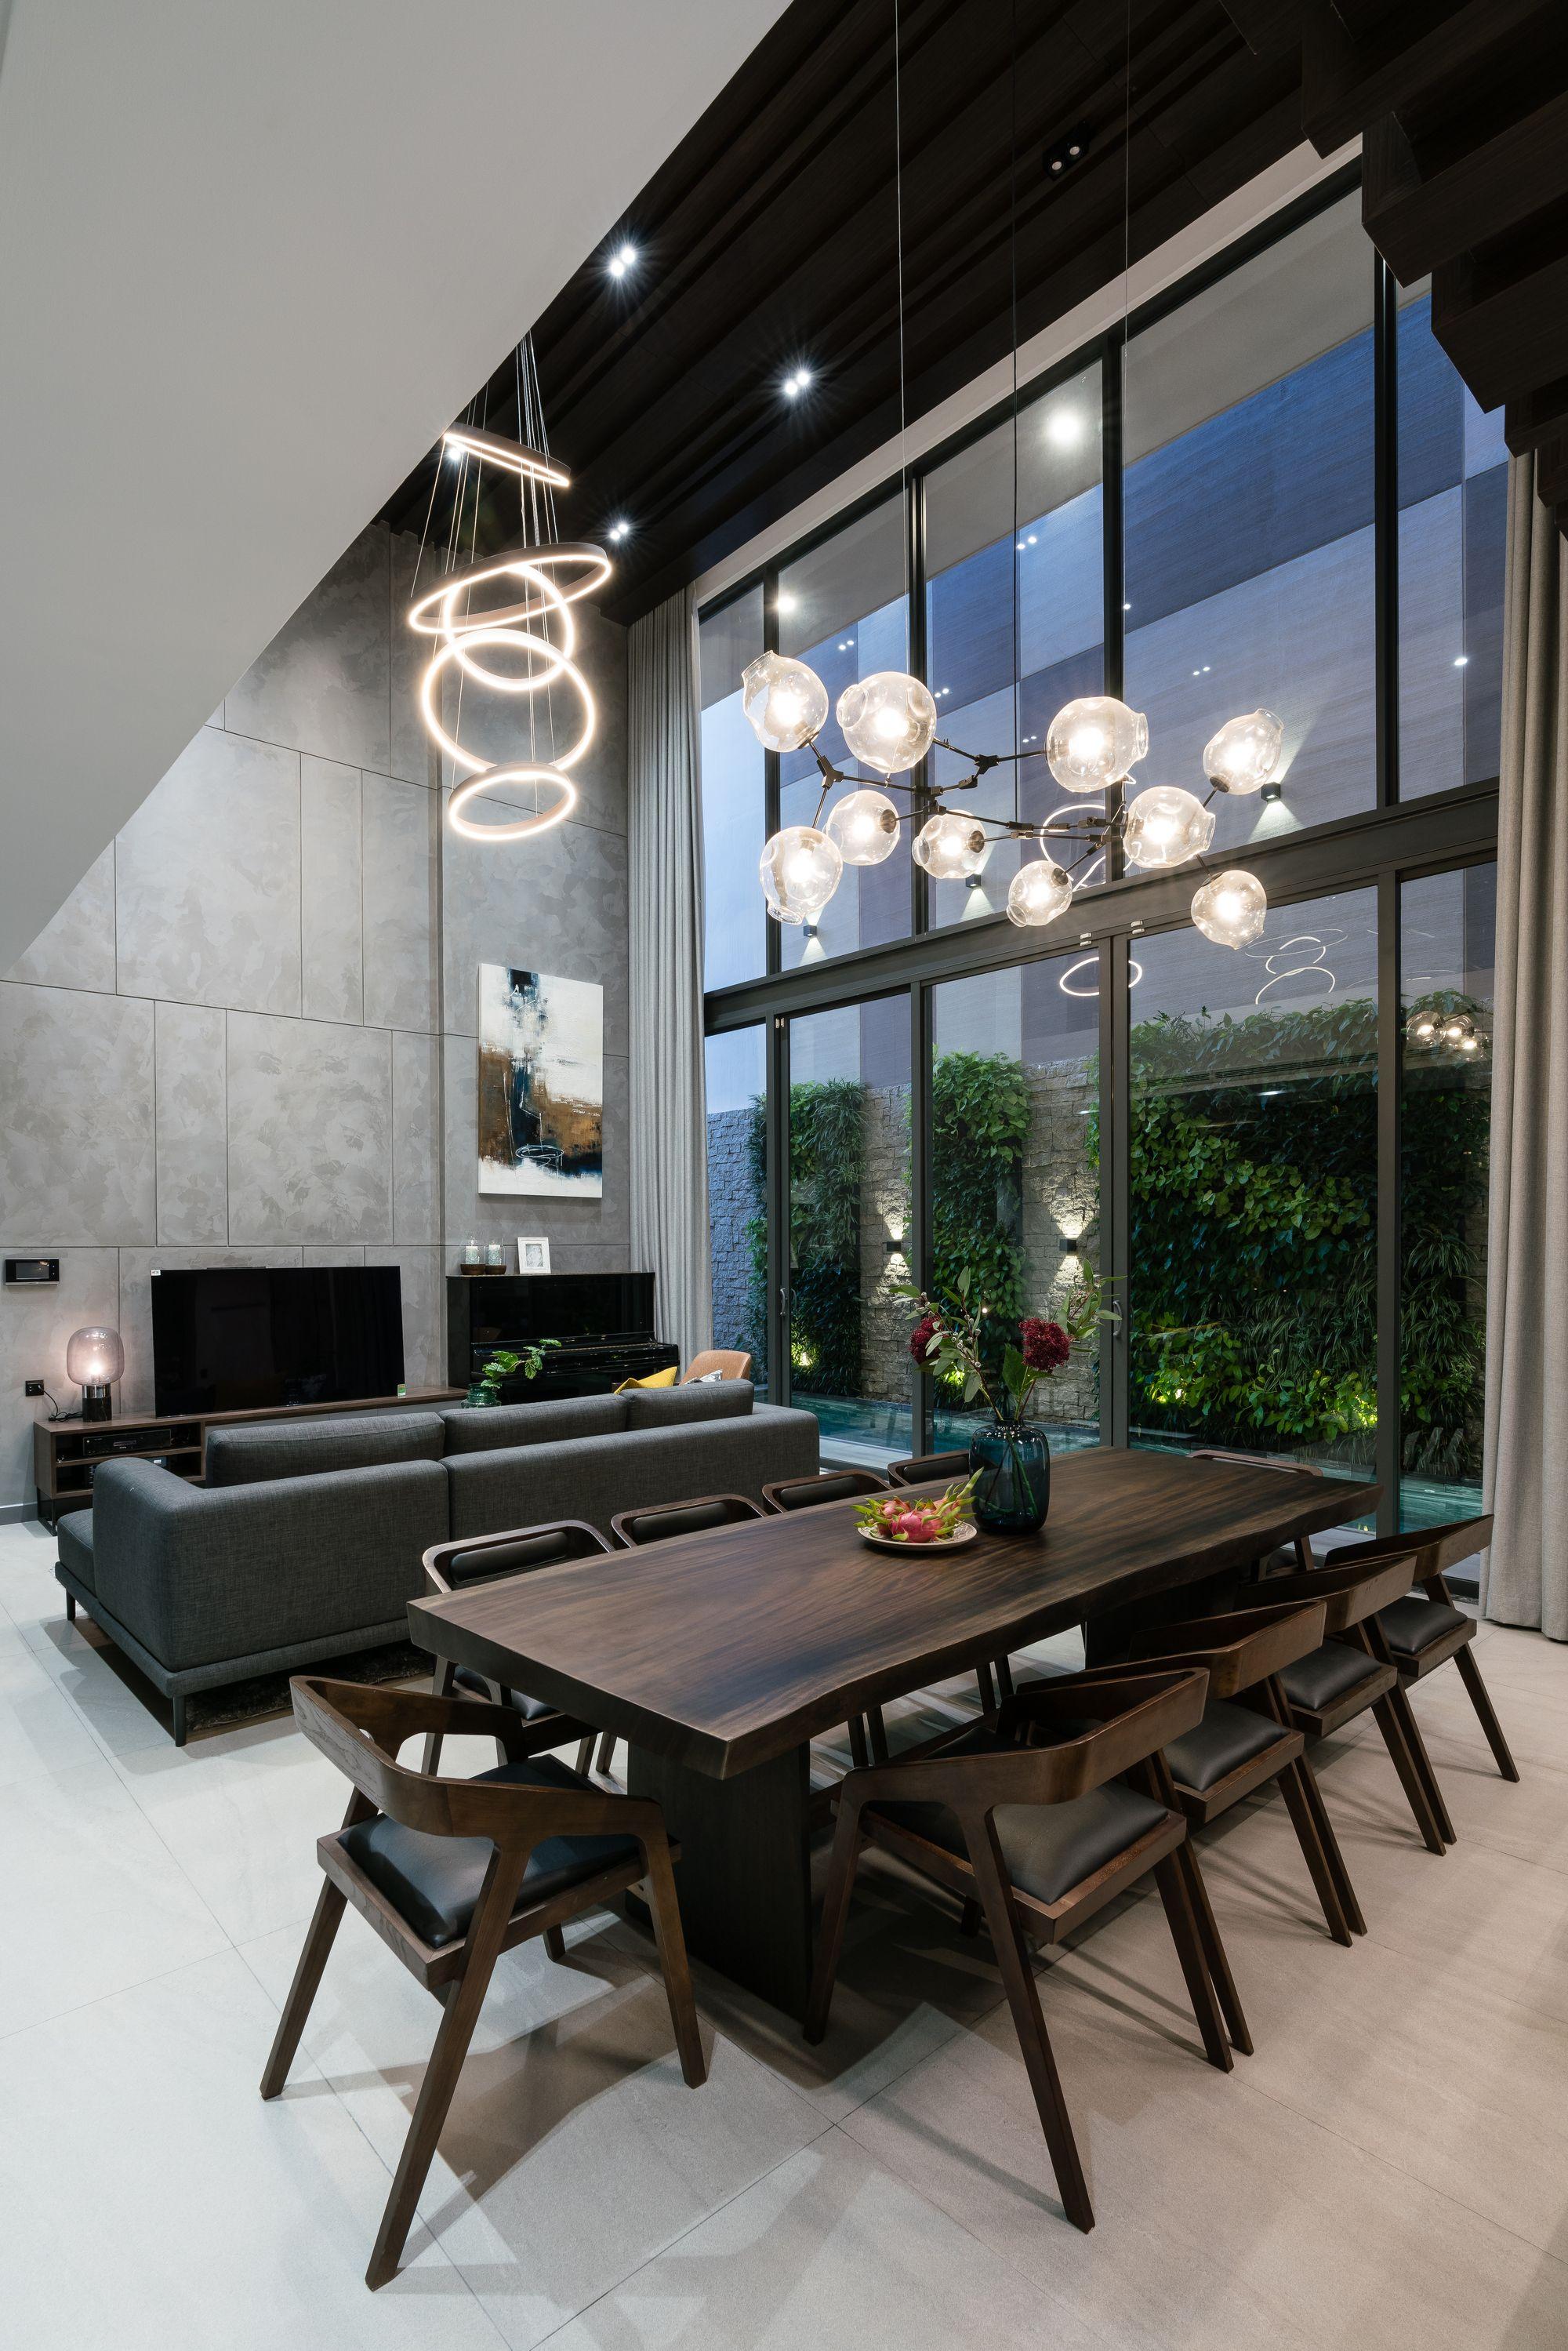 Gallery Of The Rough House Nelo Decor 2 Luxury Living Room Decor House Design Modern Houses Interior